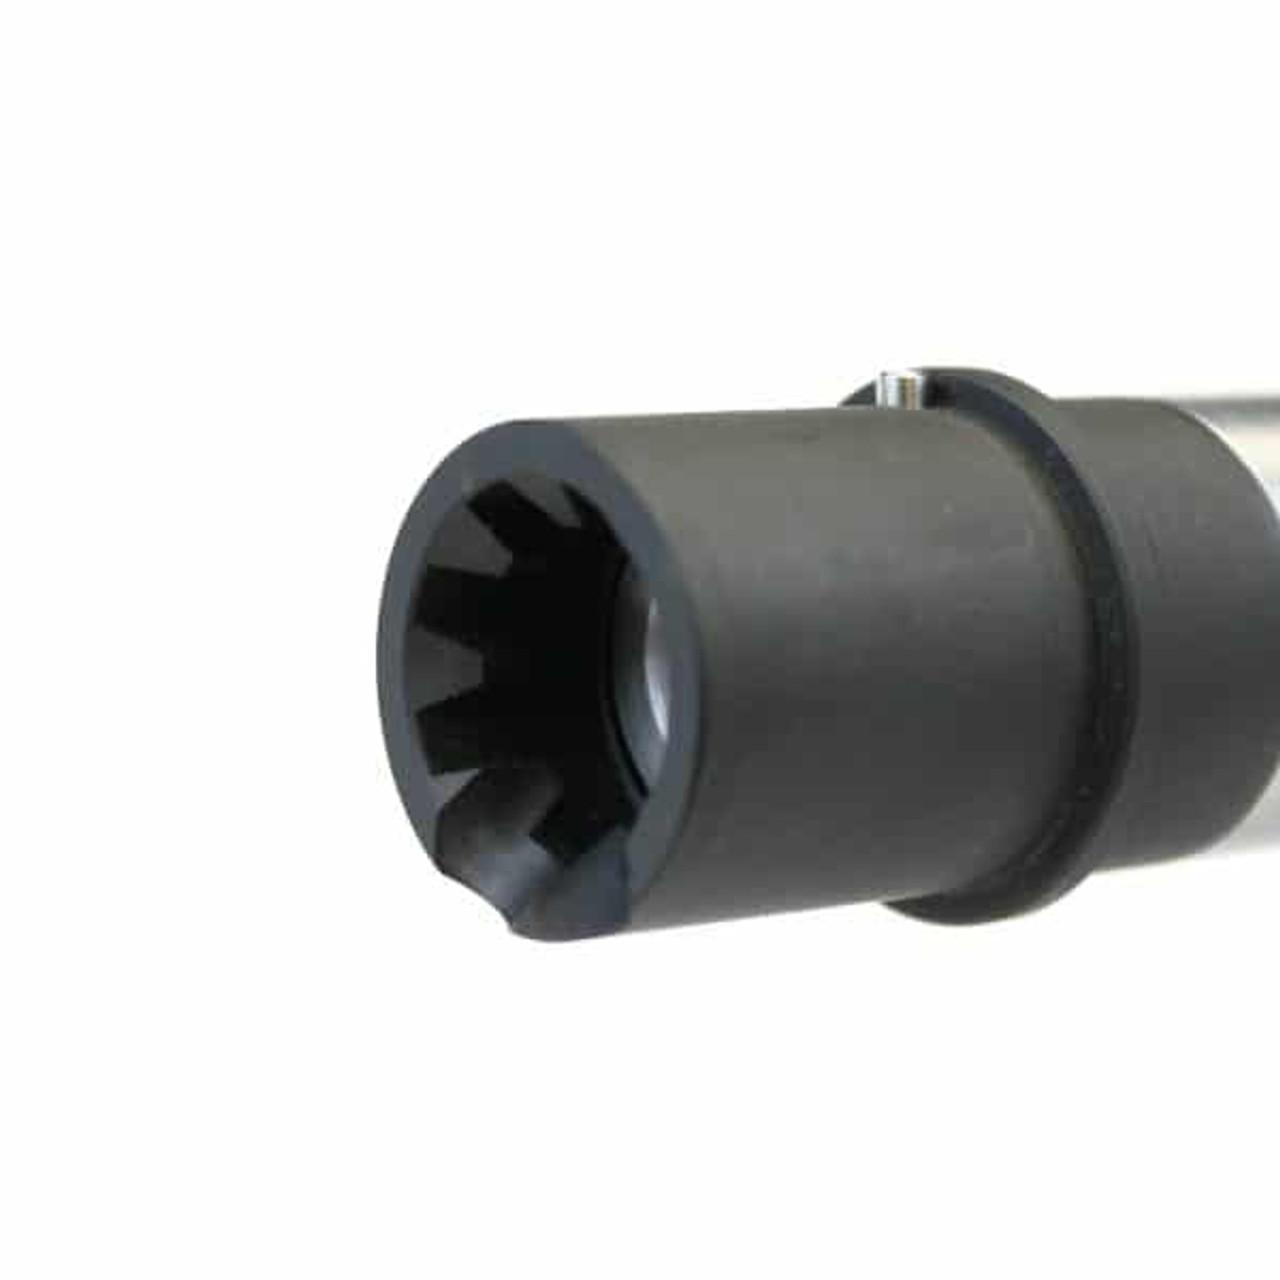 "Criterion .308 AR 20"" Hybrid Contour Barrel (Chrome lined) w/ Fulton Armory Bolt (Headspaced)"